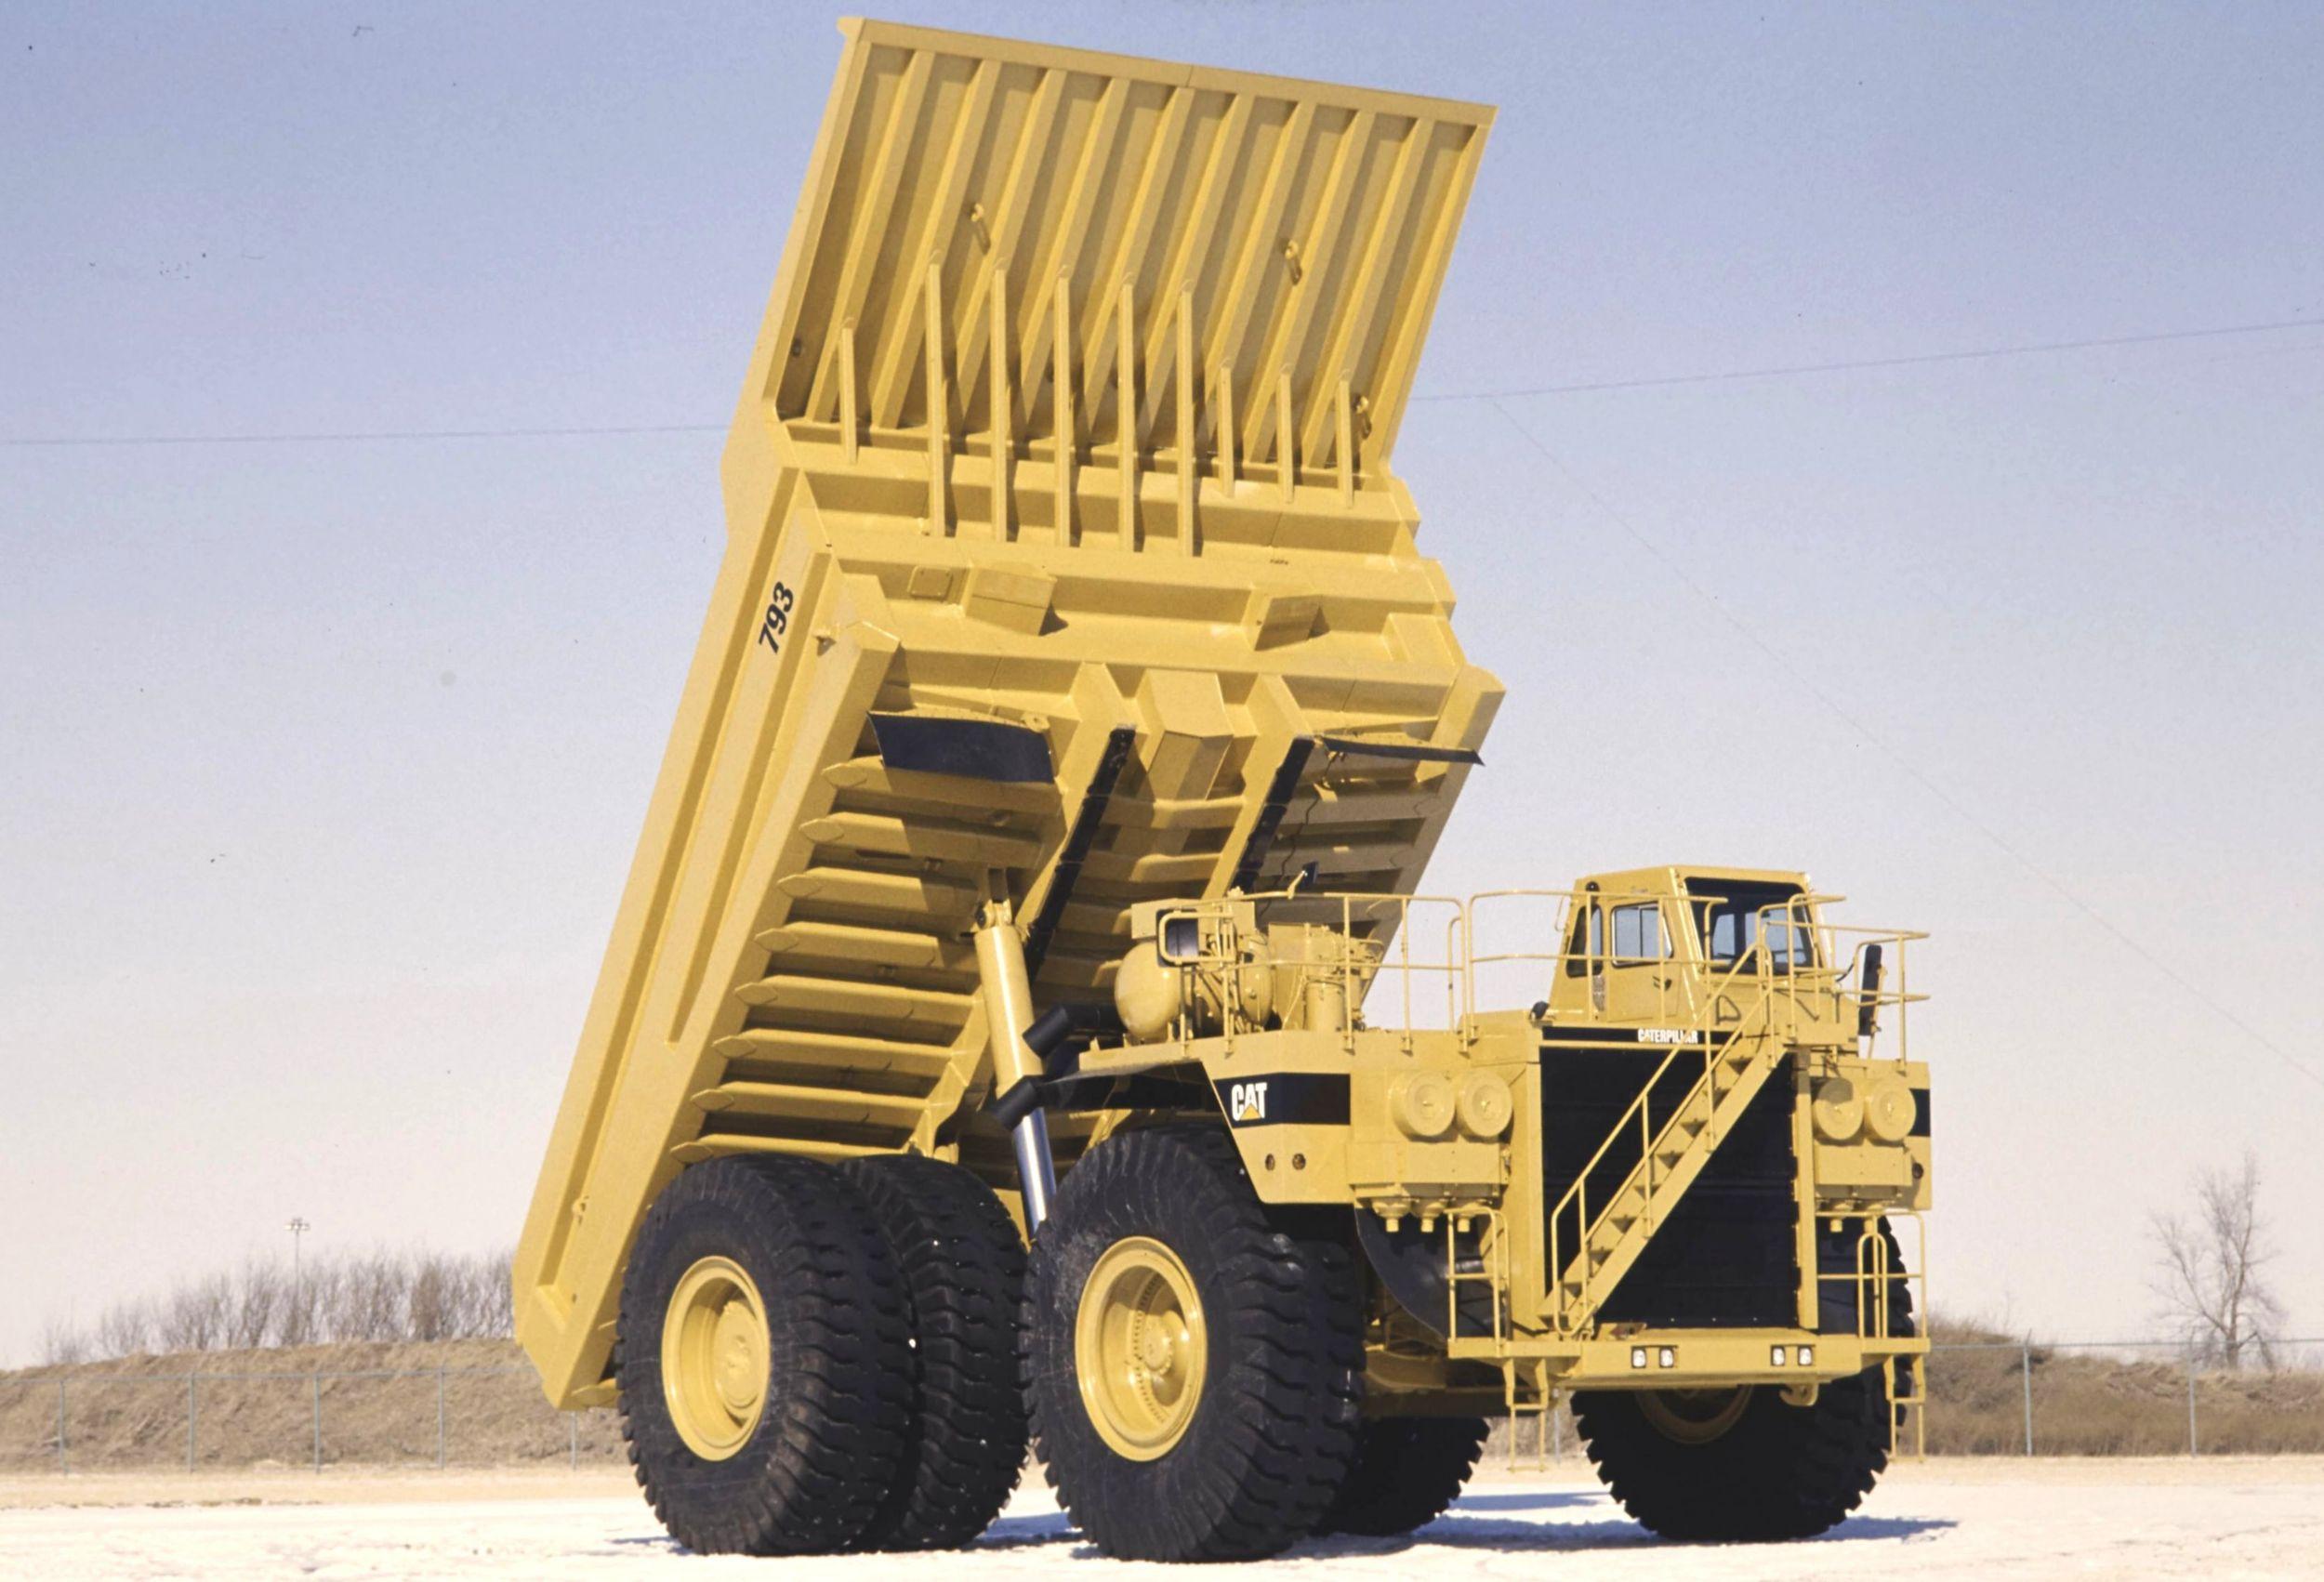 Cat® 793 Off-Highway Mining Haul Truck (circa 1991)